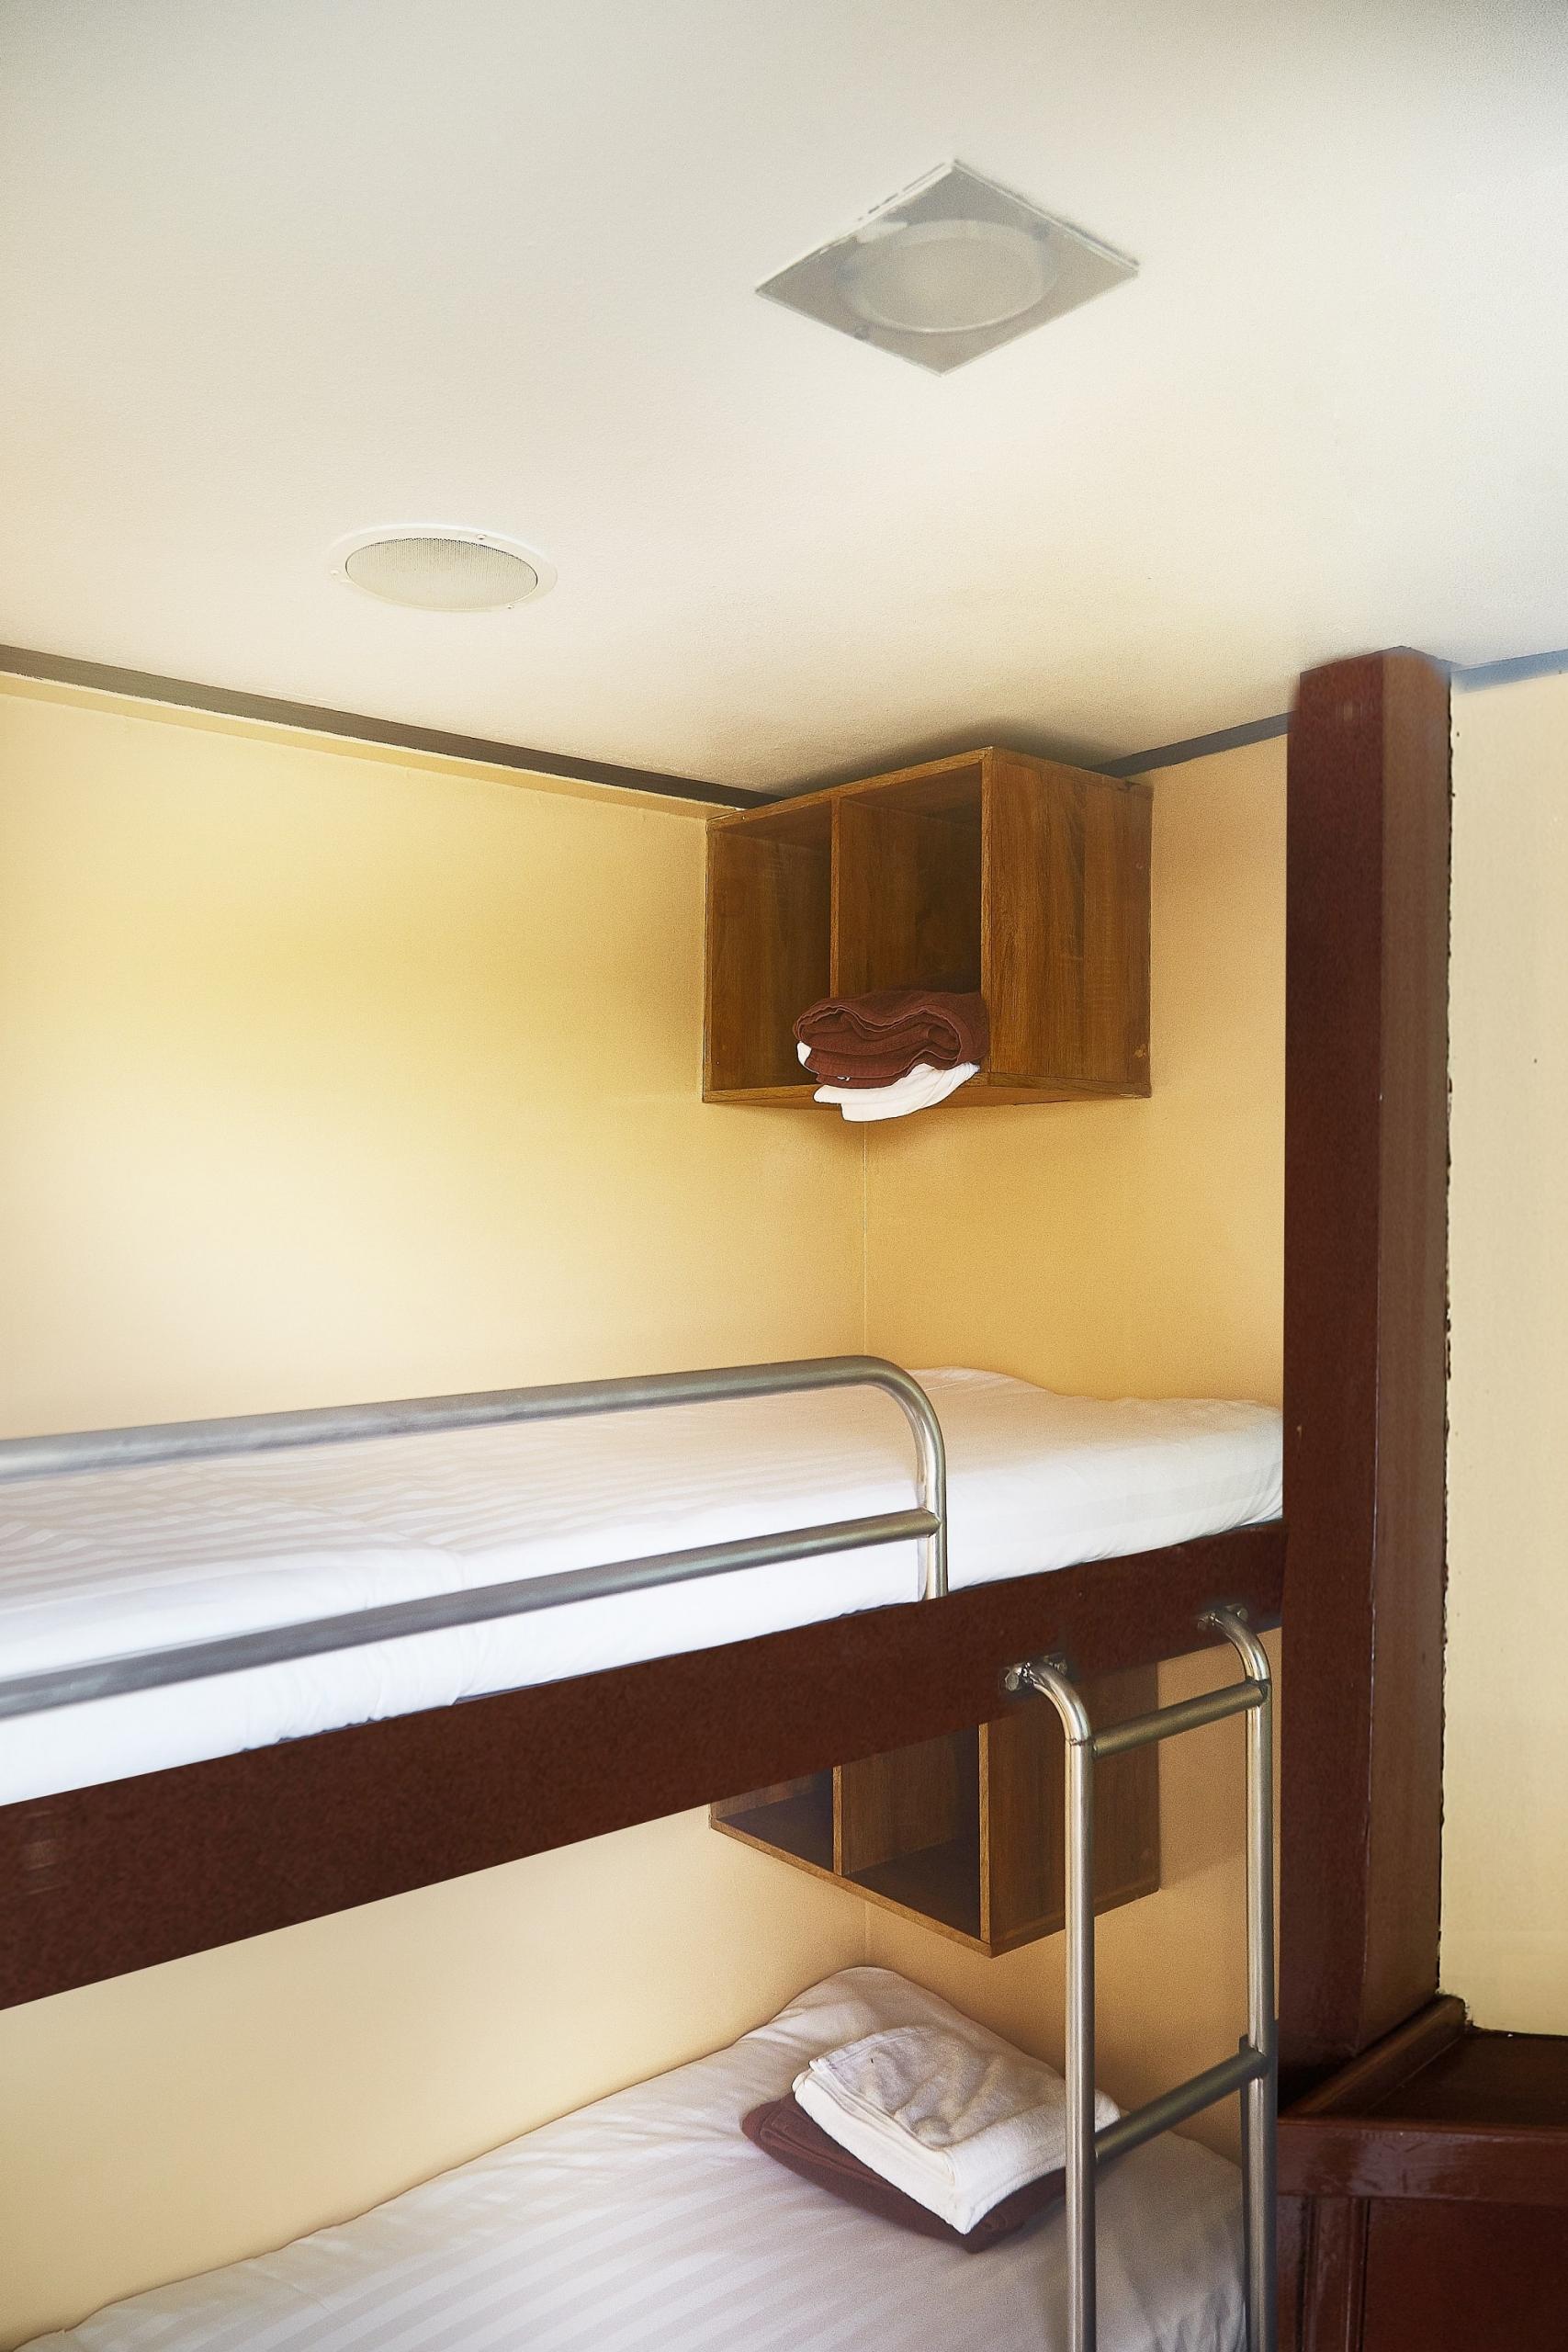 Peterpan twin bunk cabin upper deck (A)